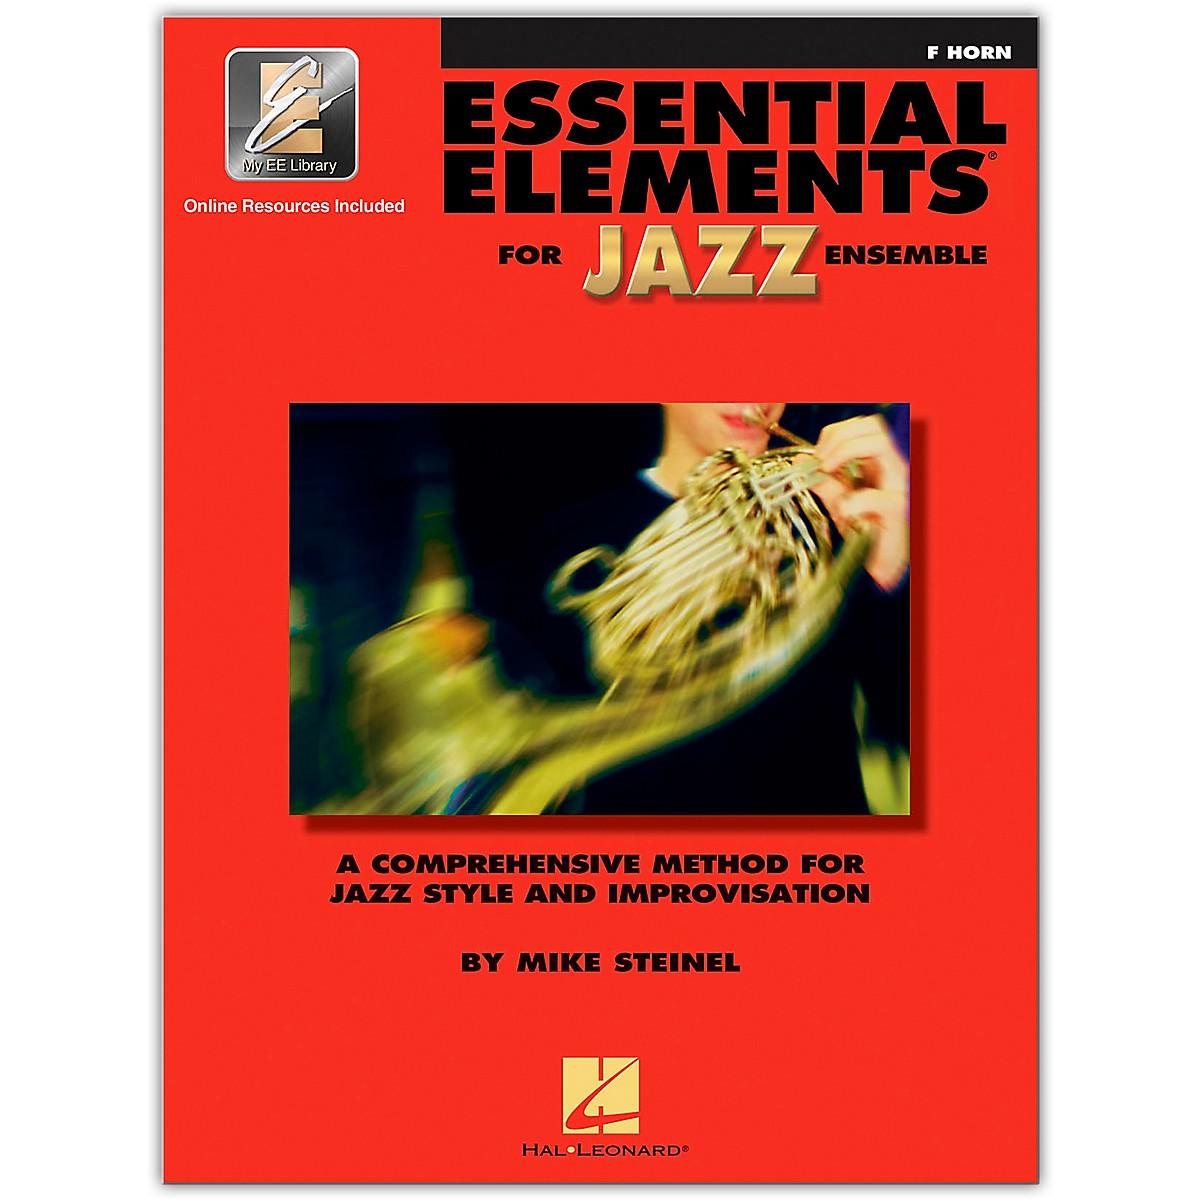 Hal Leonard Essential Elements for Jazz Ensemble - French Horn (Book/Online Audio)